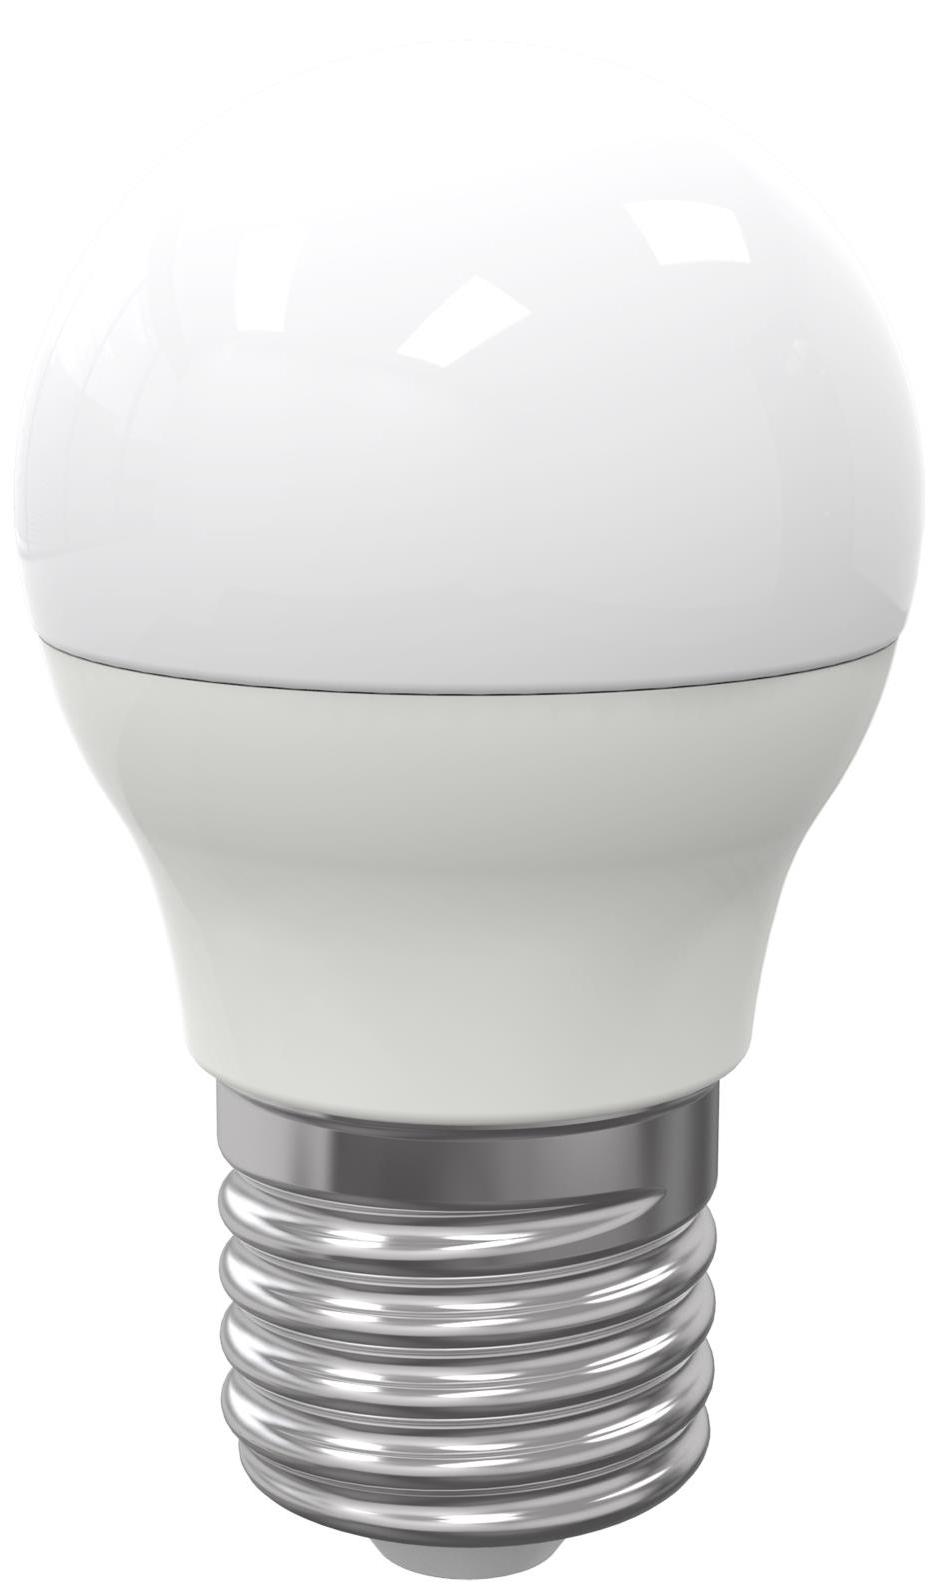 Лампа светодиодная REV, G45, теплый свет, цоколь E27, 9 Вт. 32408 9 лампа светодиодная smartbuy g45 теплый свет цоколь е27 7 вт